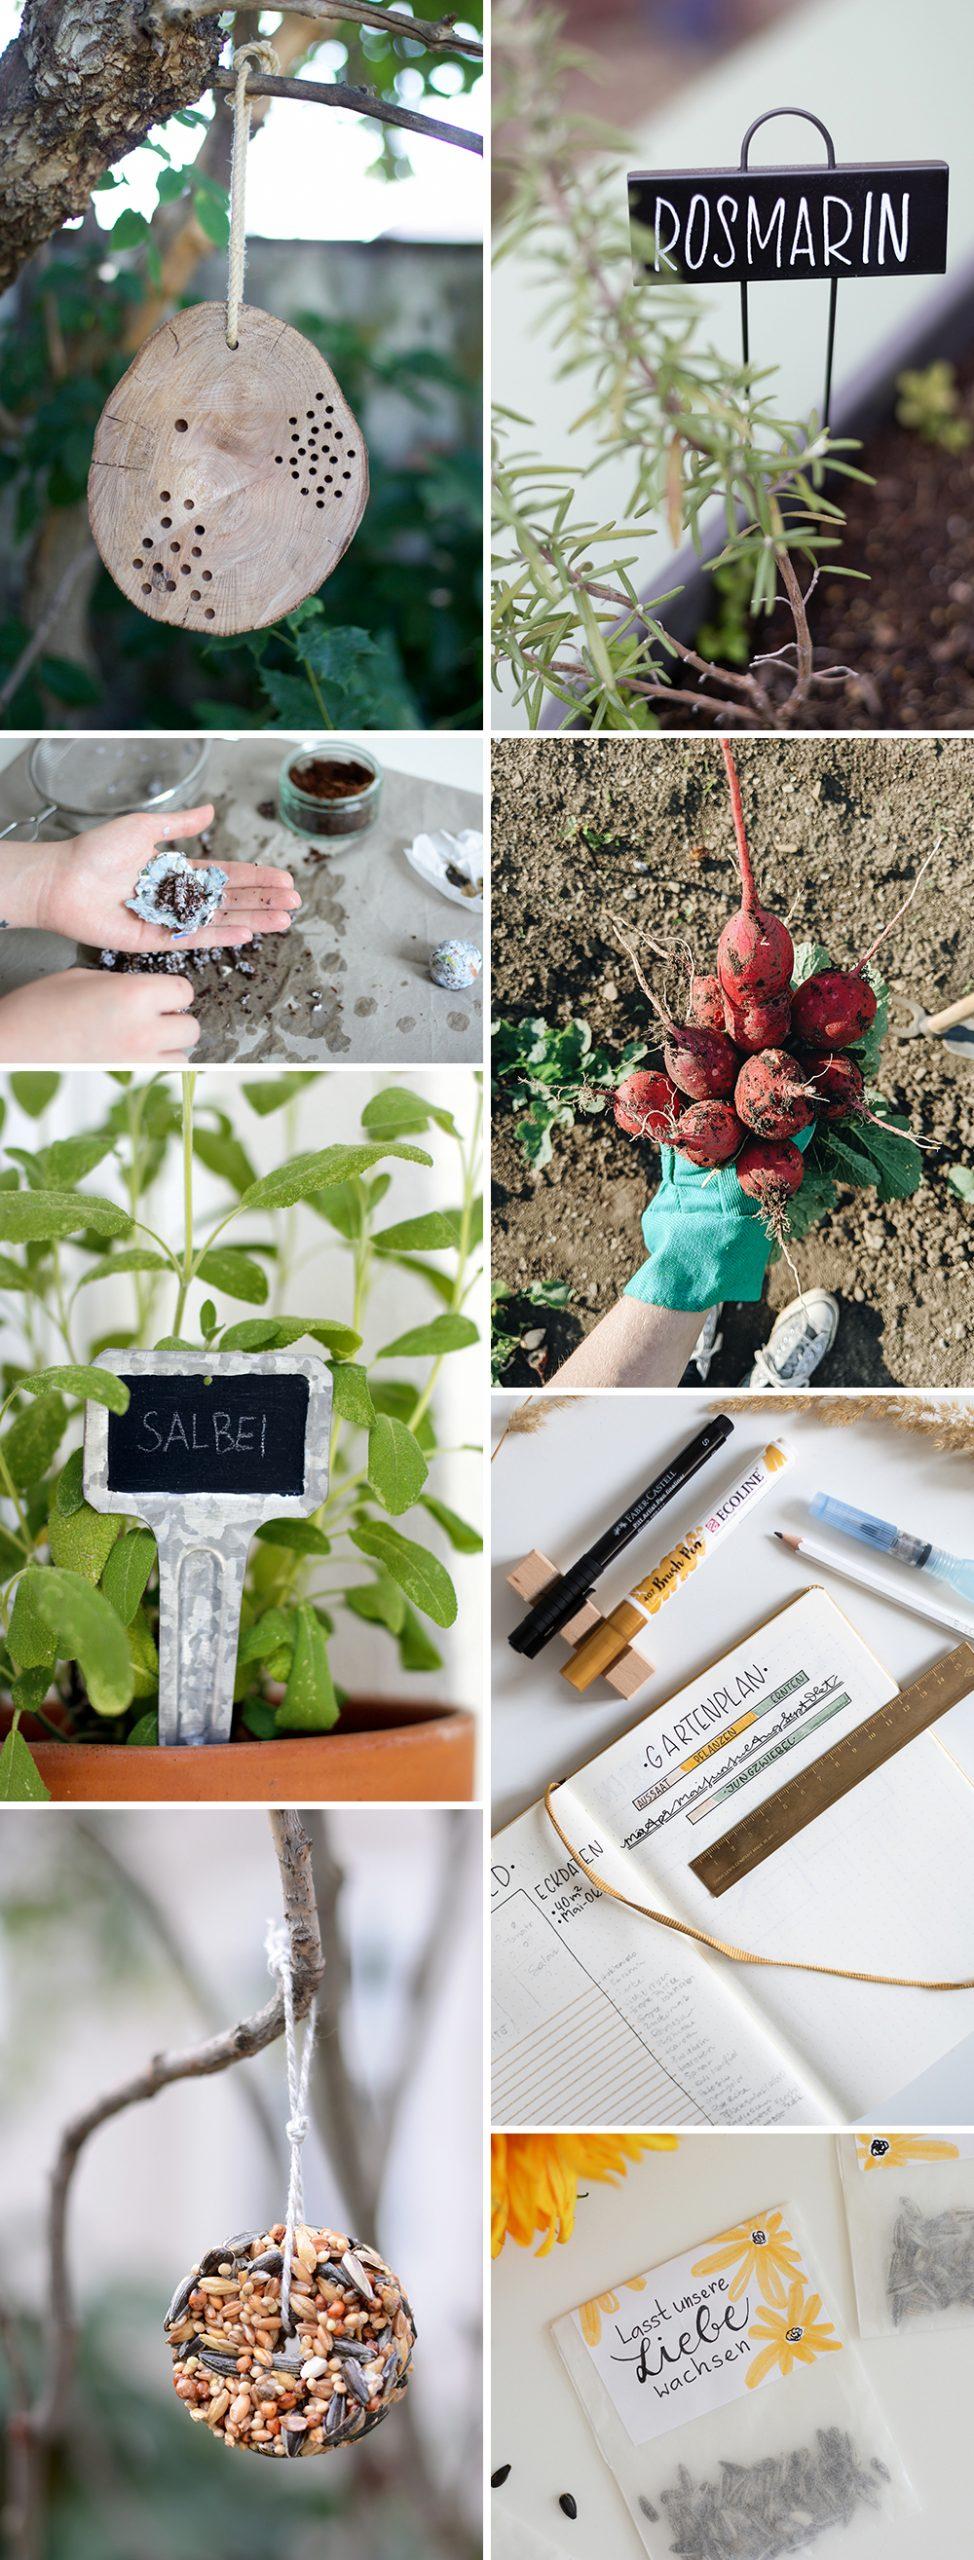 Inspiration: DIYs für den Garten | we love handmade